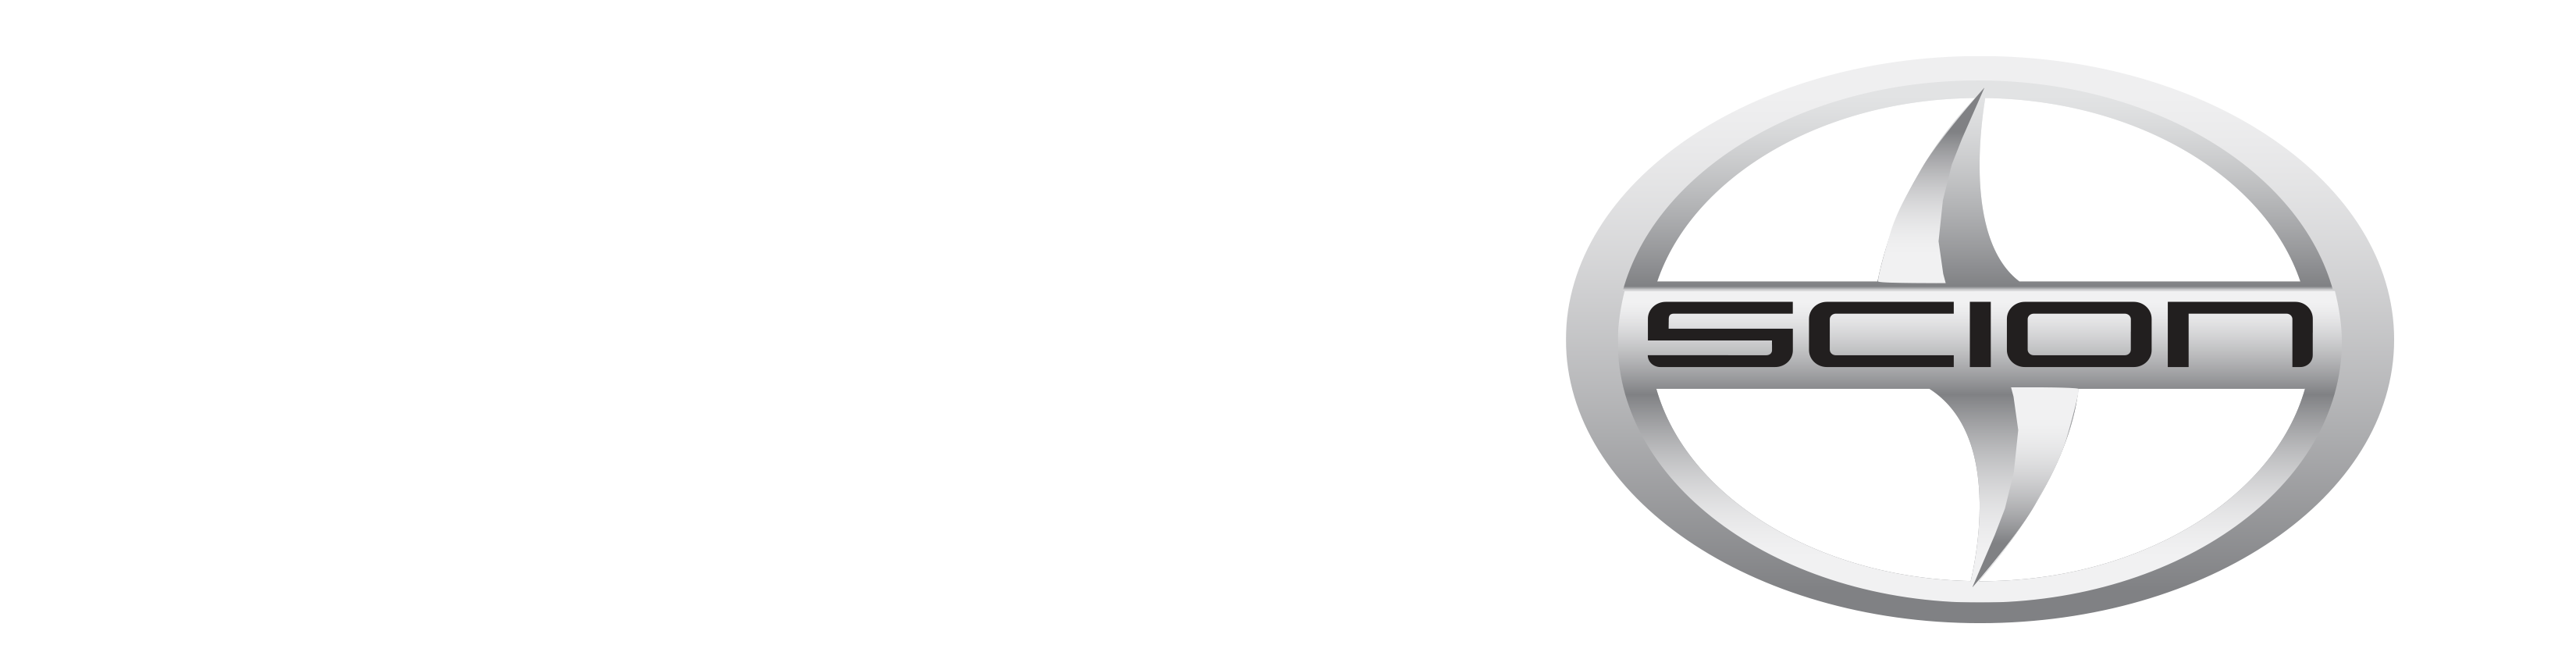 scion toyota logo wht.png